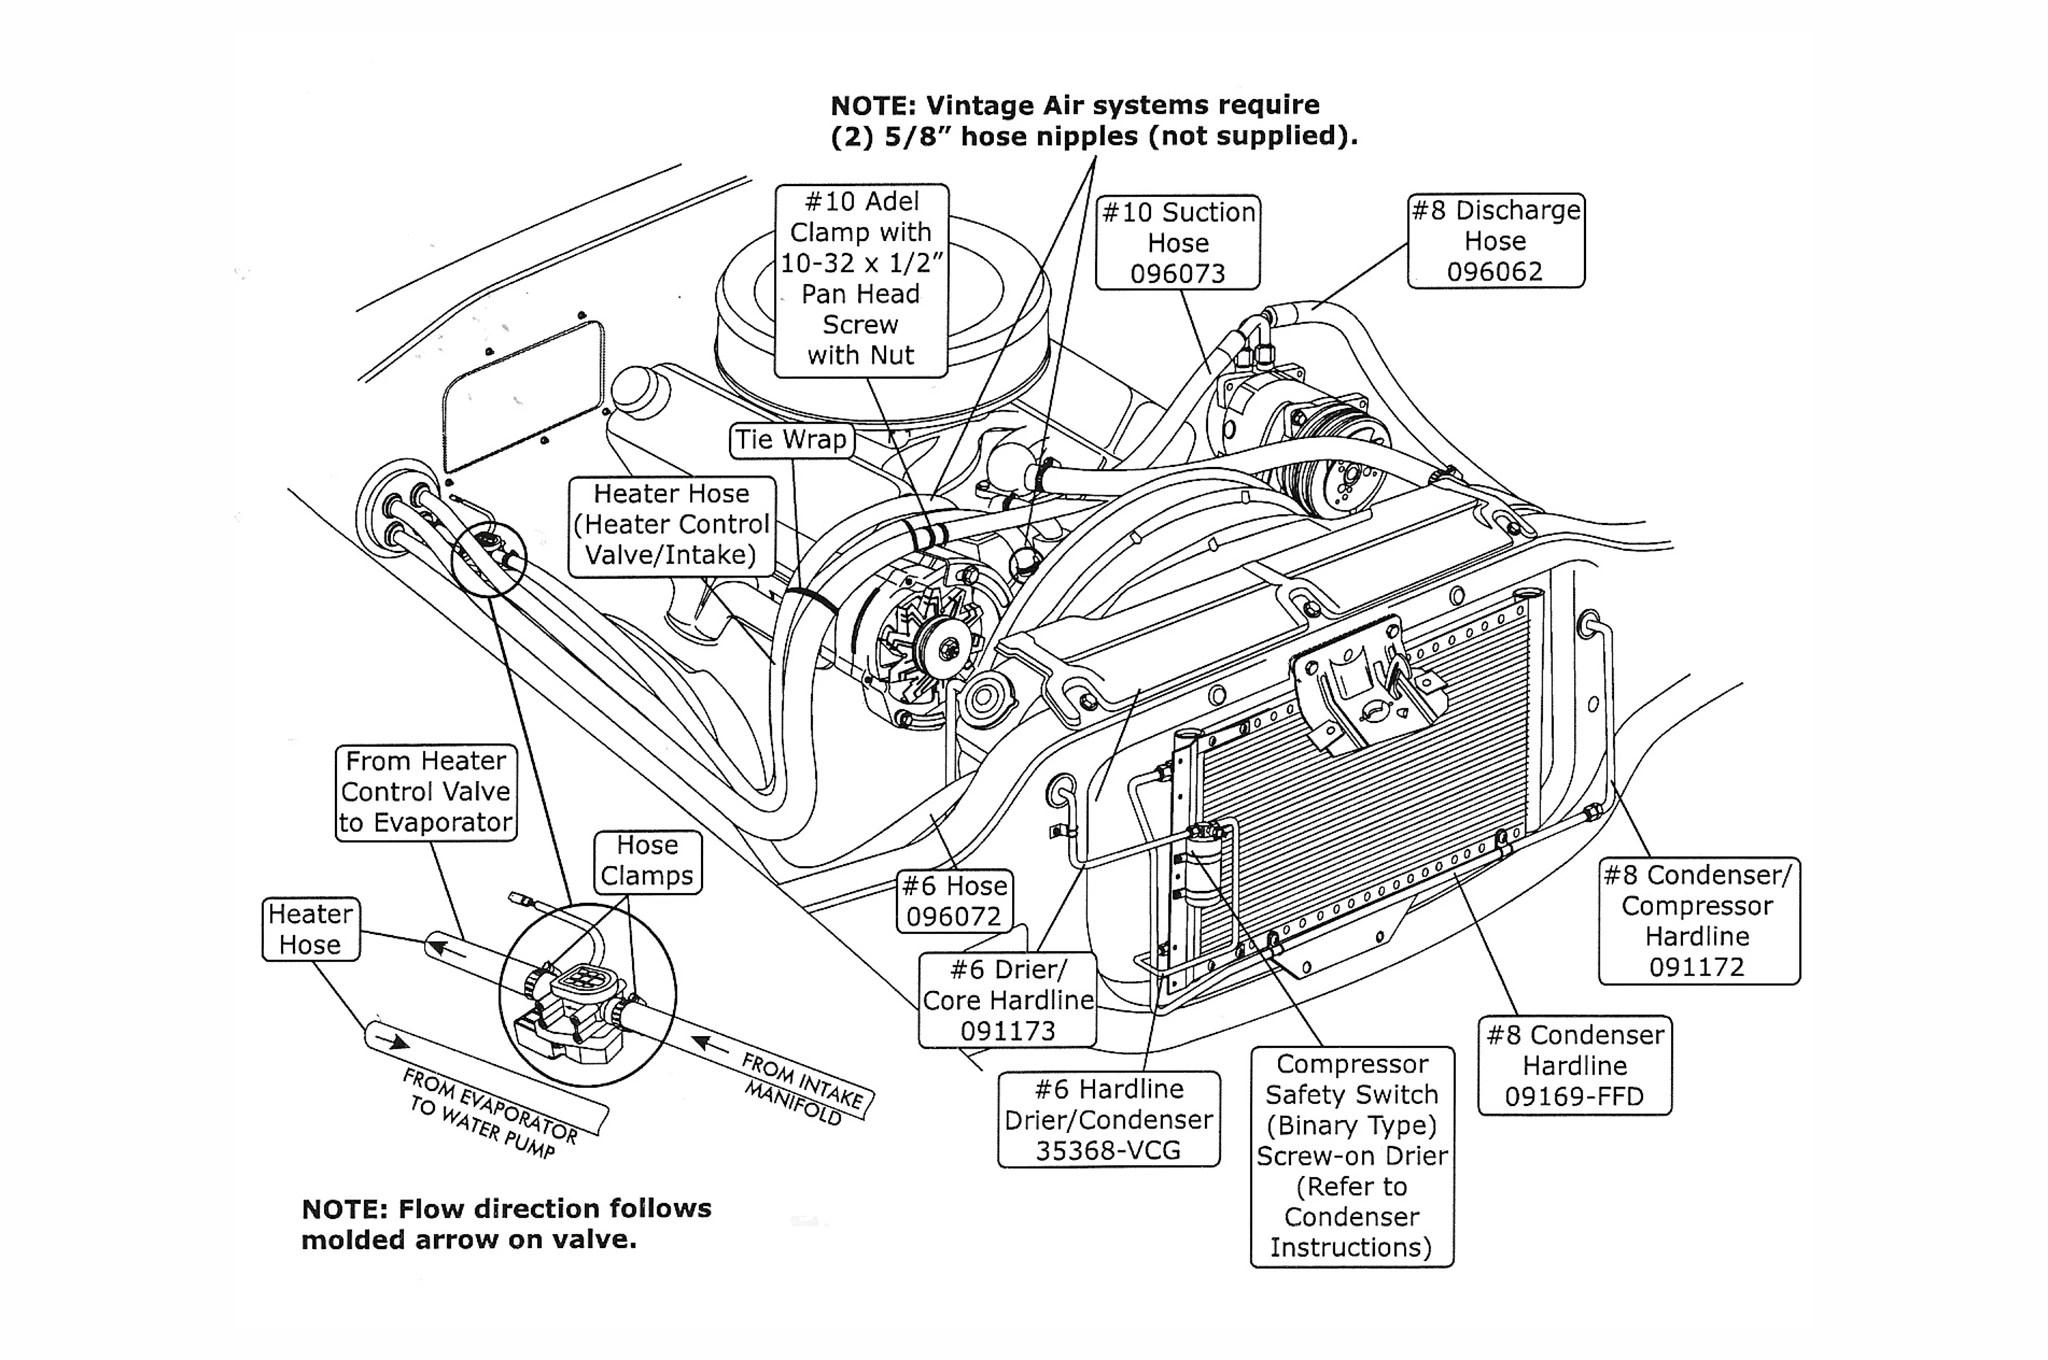 medium resolution of 1971 chevelle fuel line diagram wiring diagram paper el camino fuel system diagram